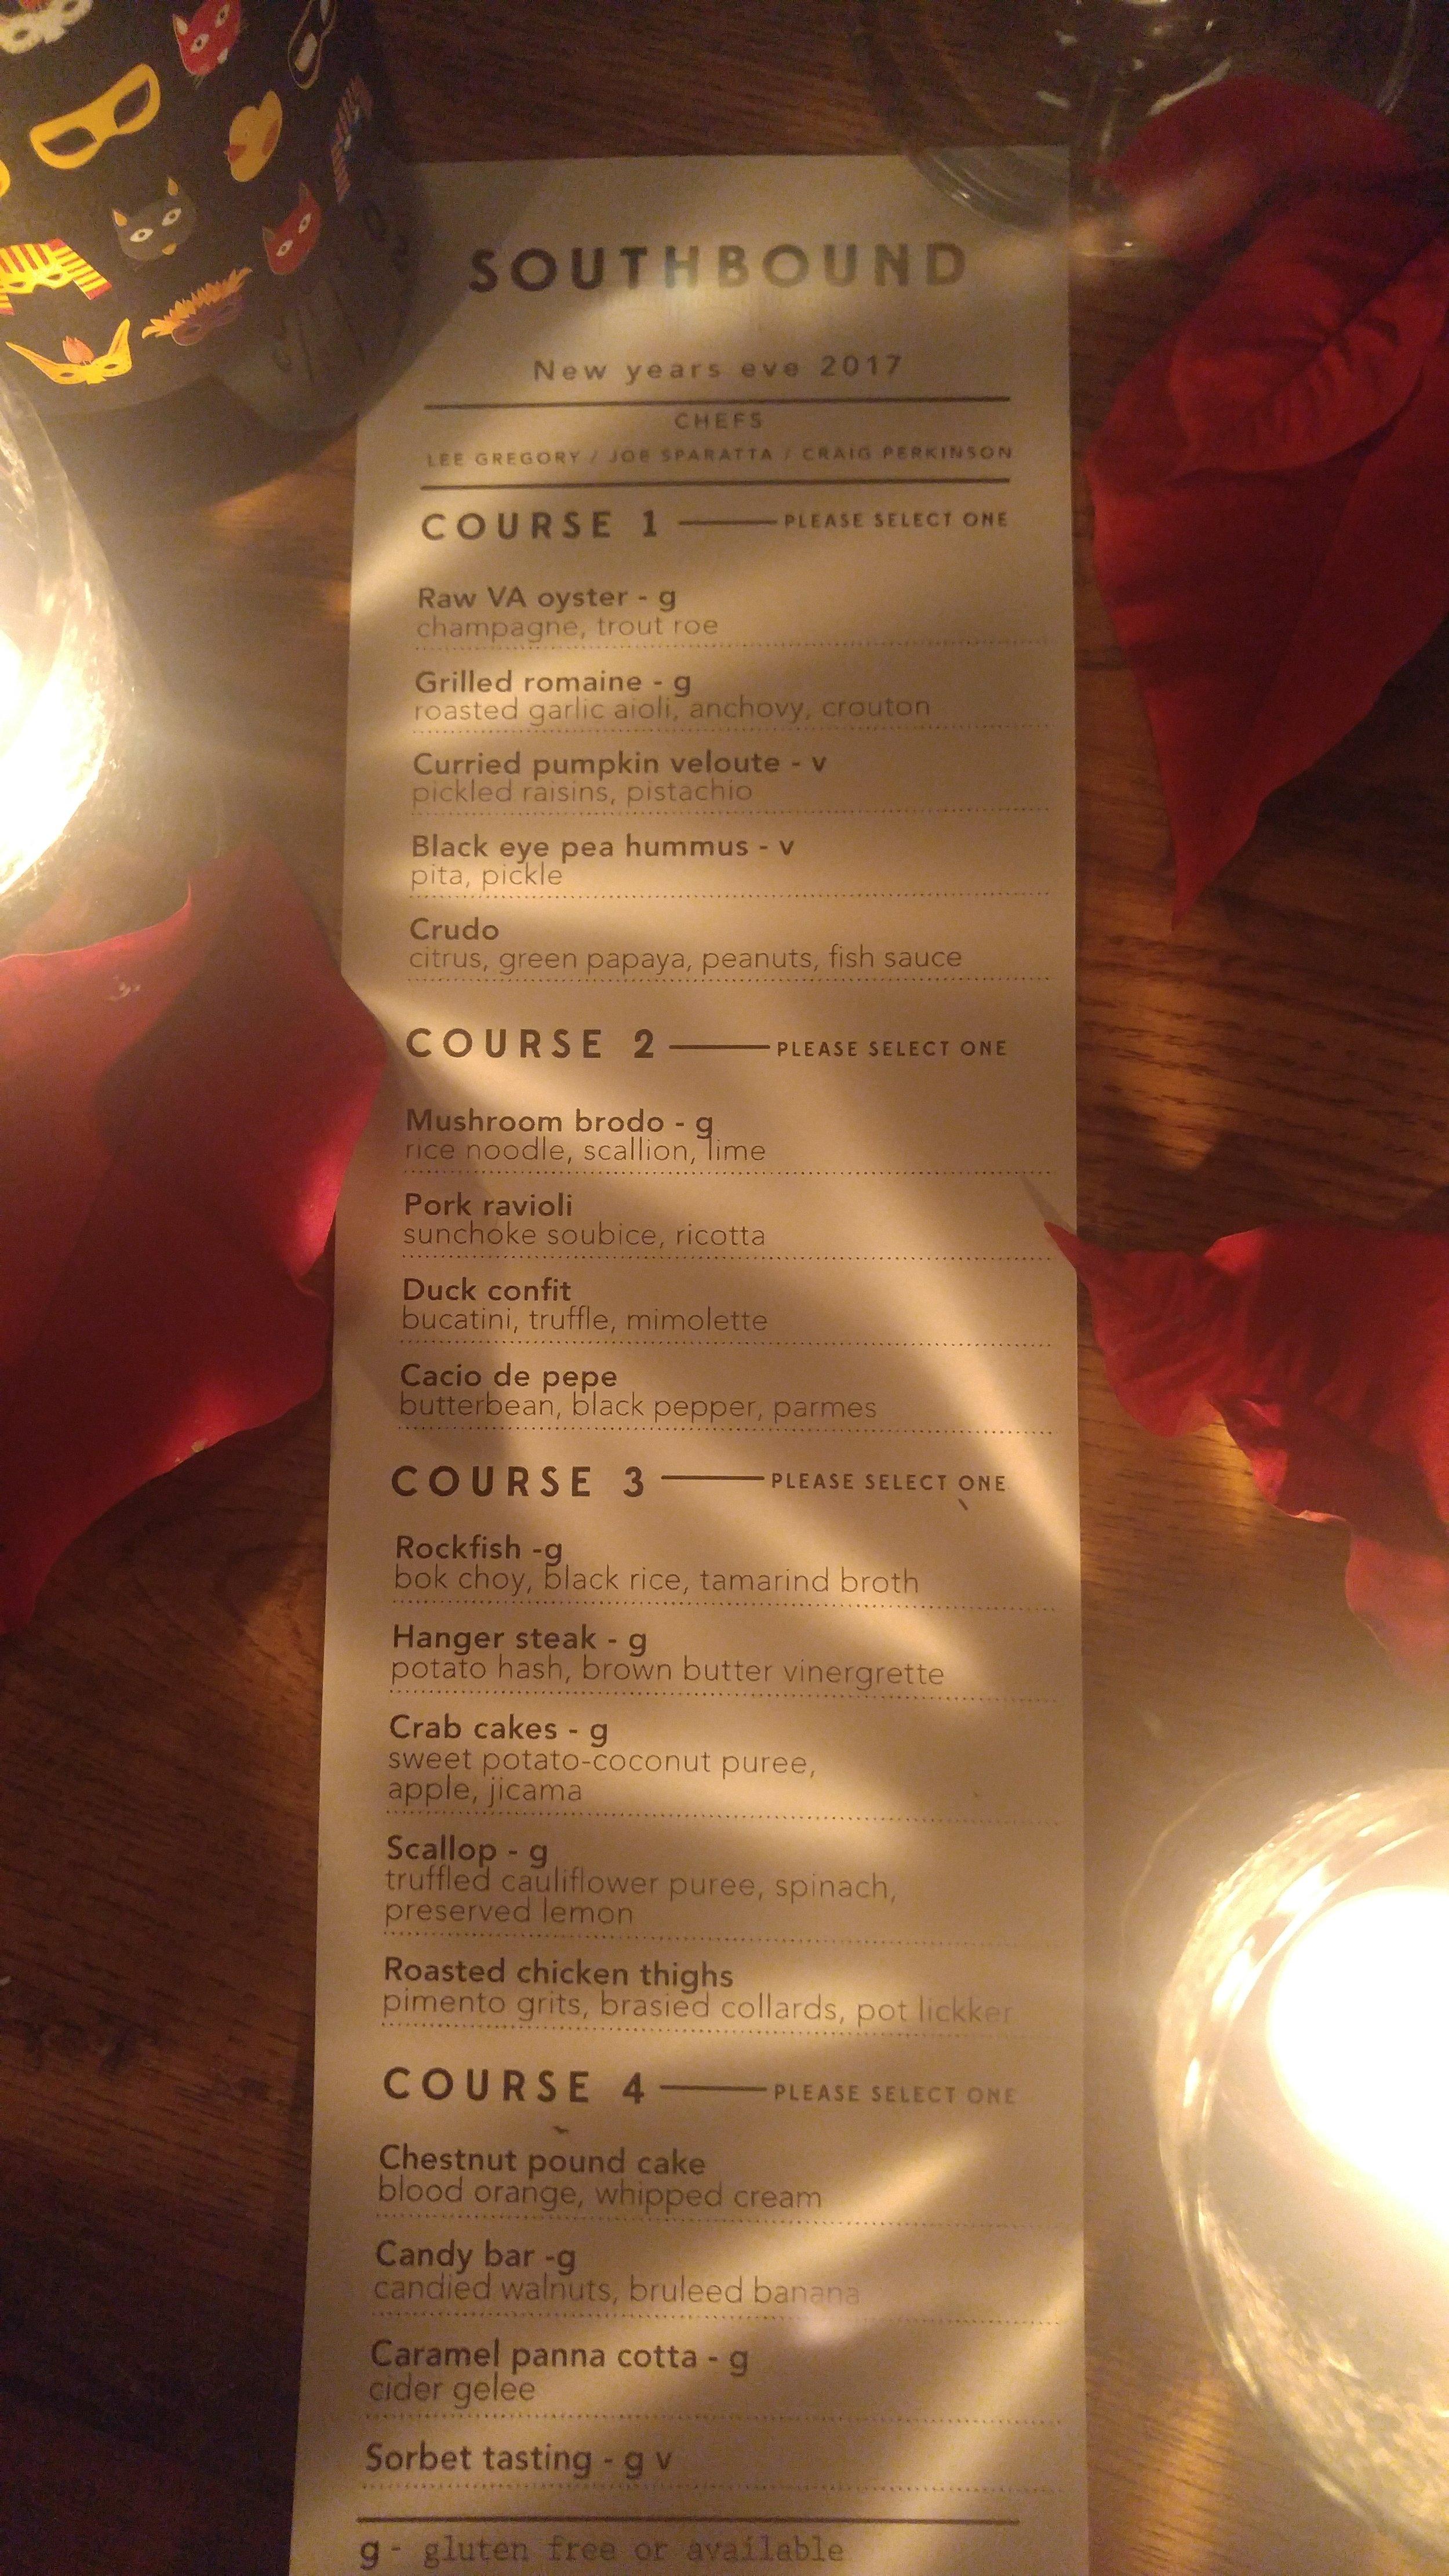 New Years eve menu pic.jpg